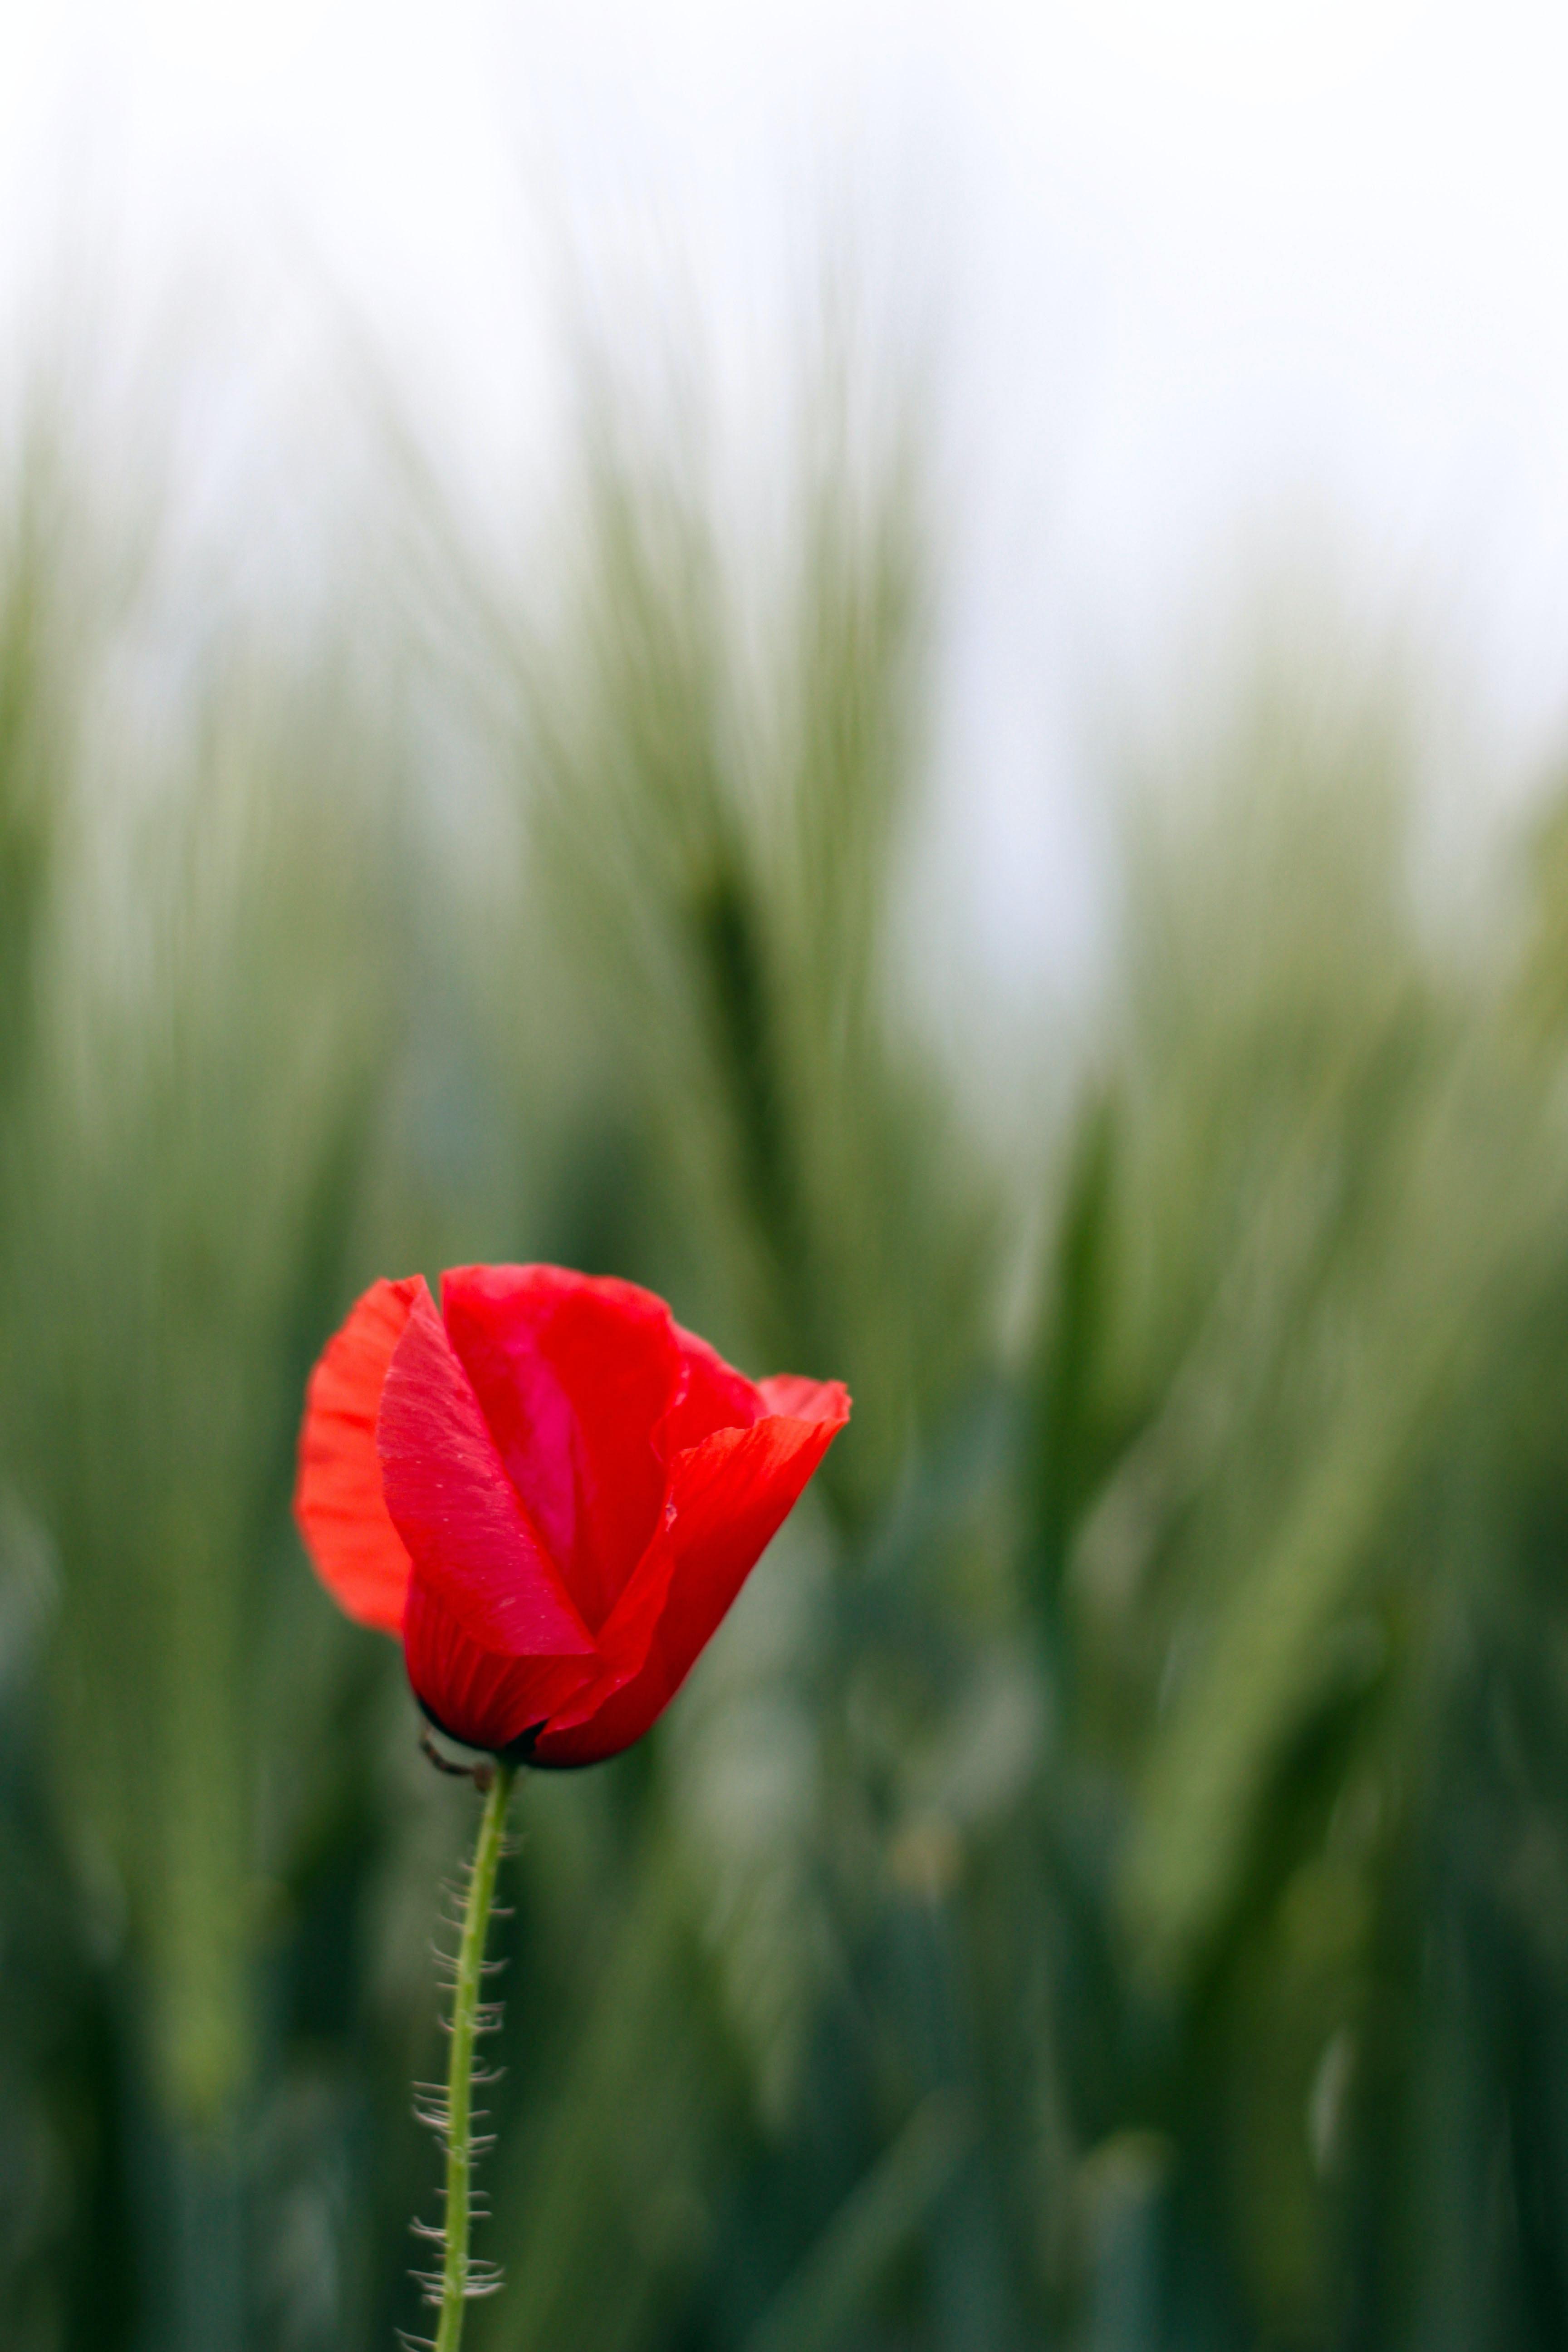 Single red tulip blooms near tall grass